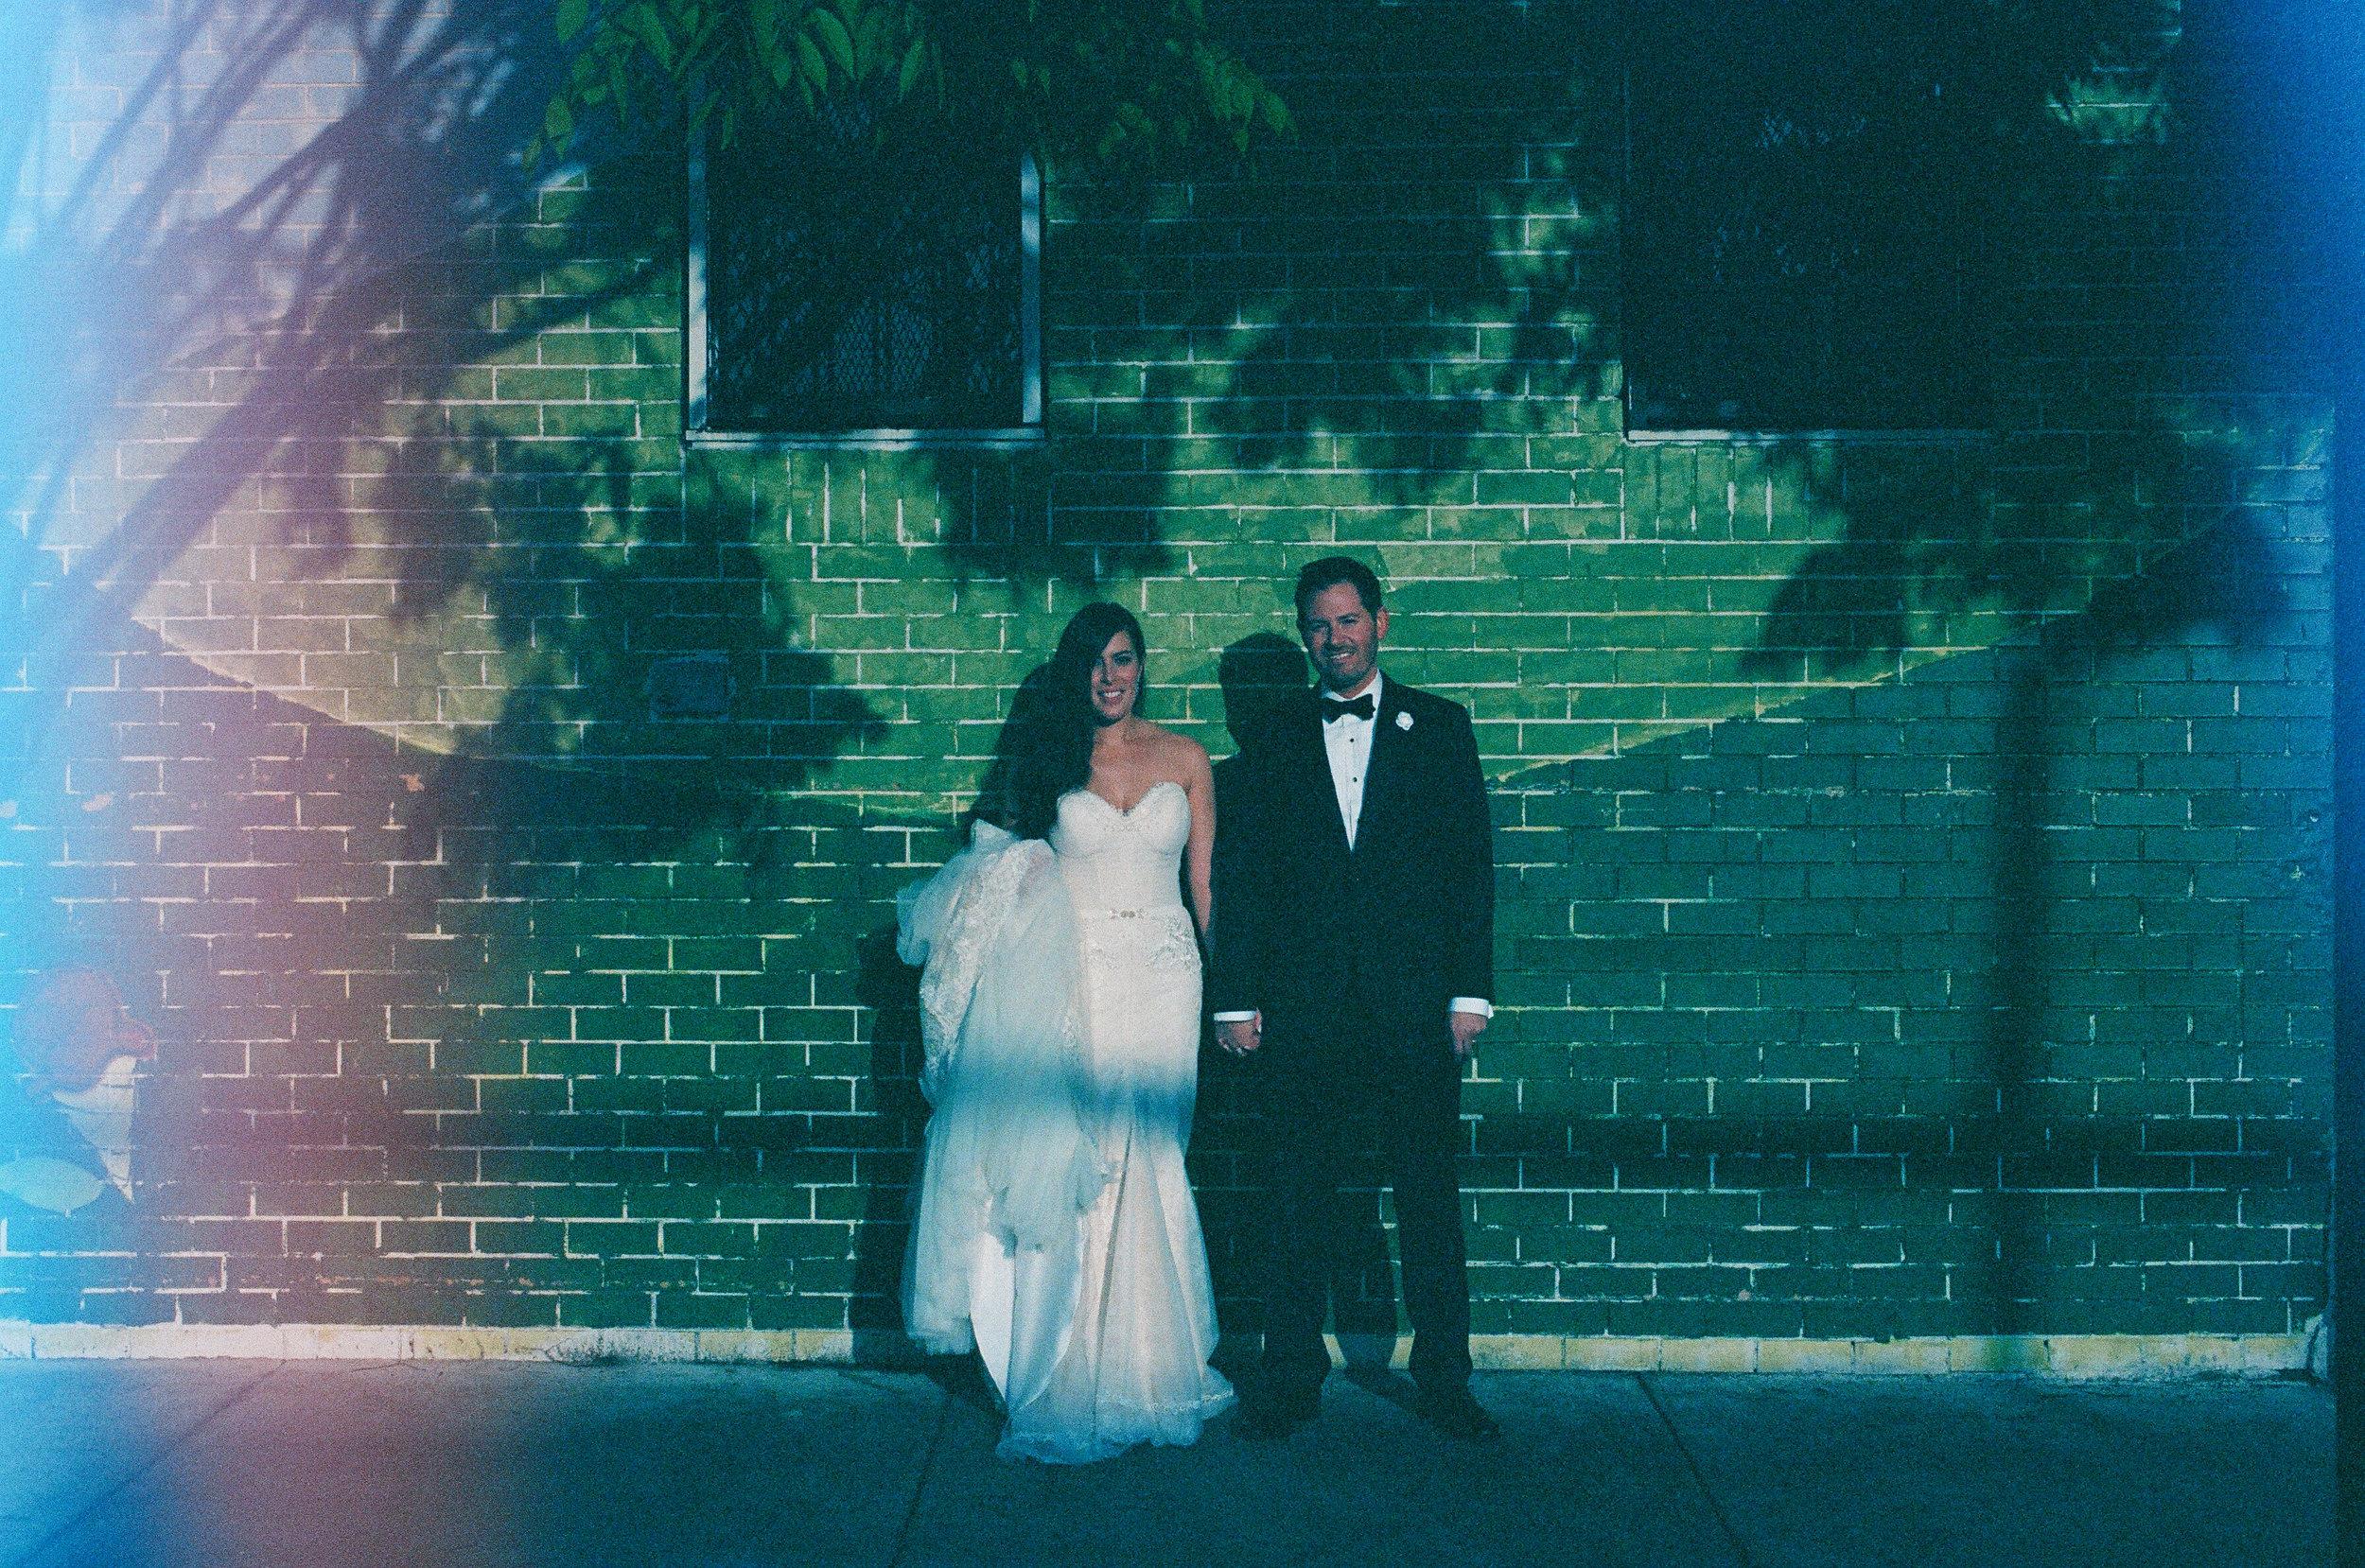 35mmfilmweddingphotographerlightleaksdoubleexposurebrooklyn(96of146).jpg